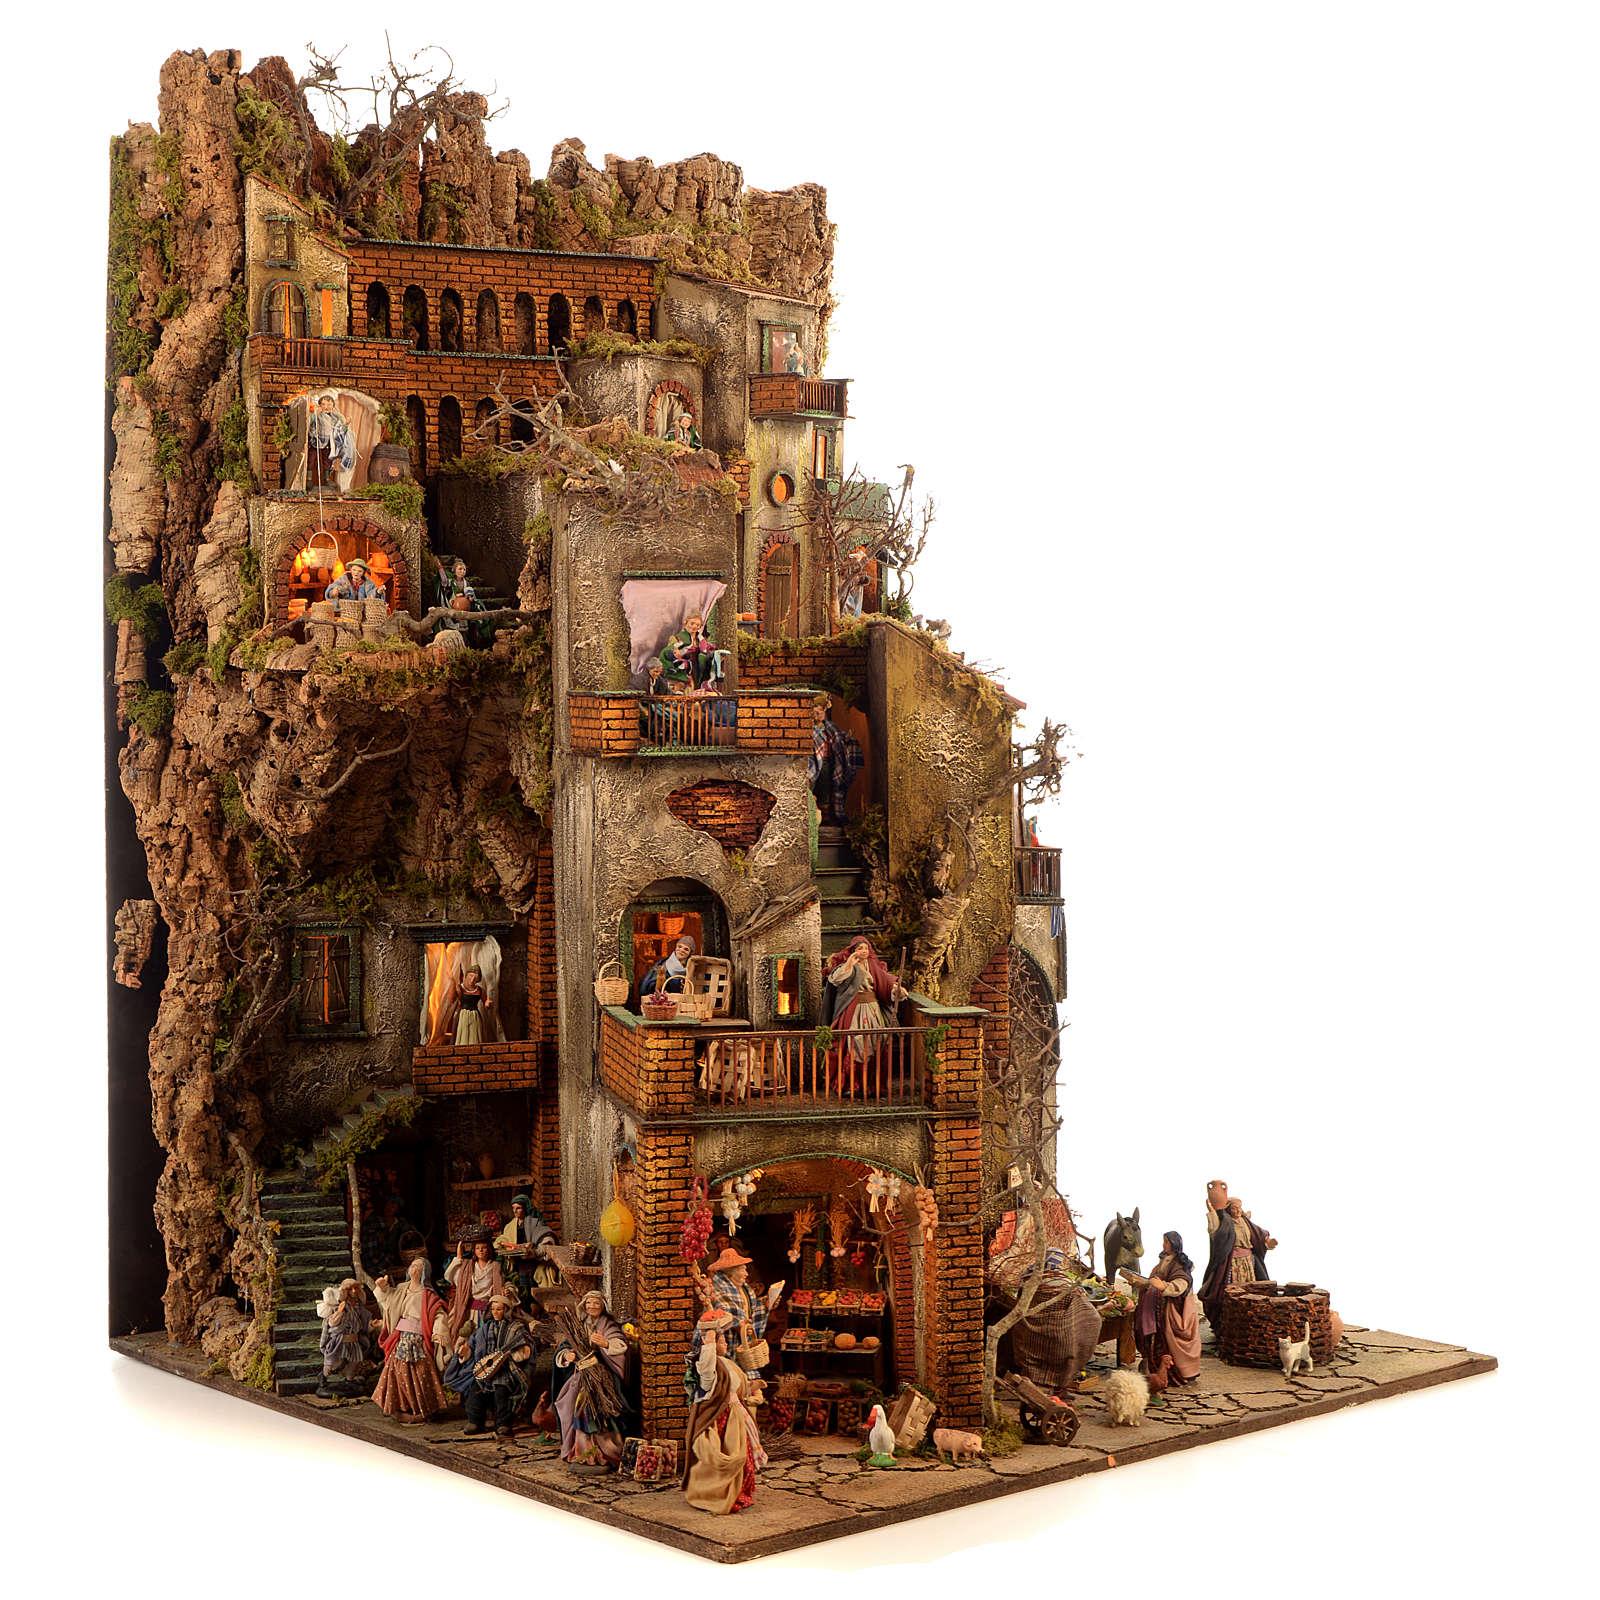 Village setting for Neapolitan Nativity scene 120x100x100 cm, module C, 34 shepherds, 9 movements - 14 cm 4